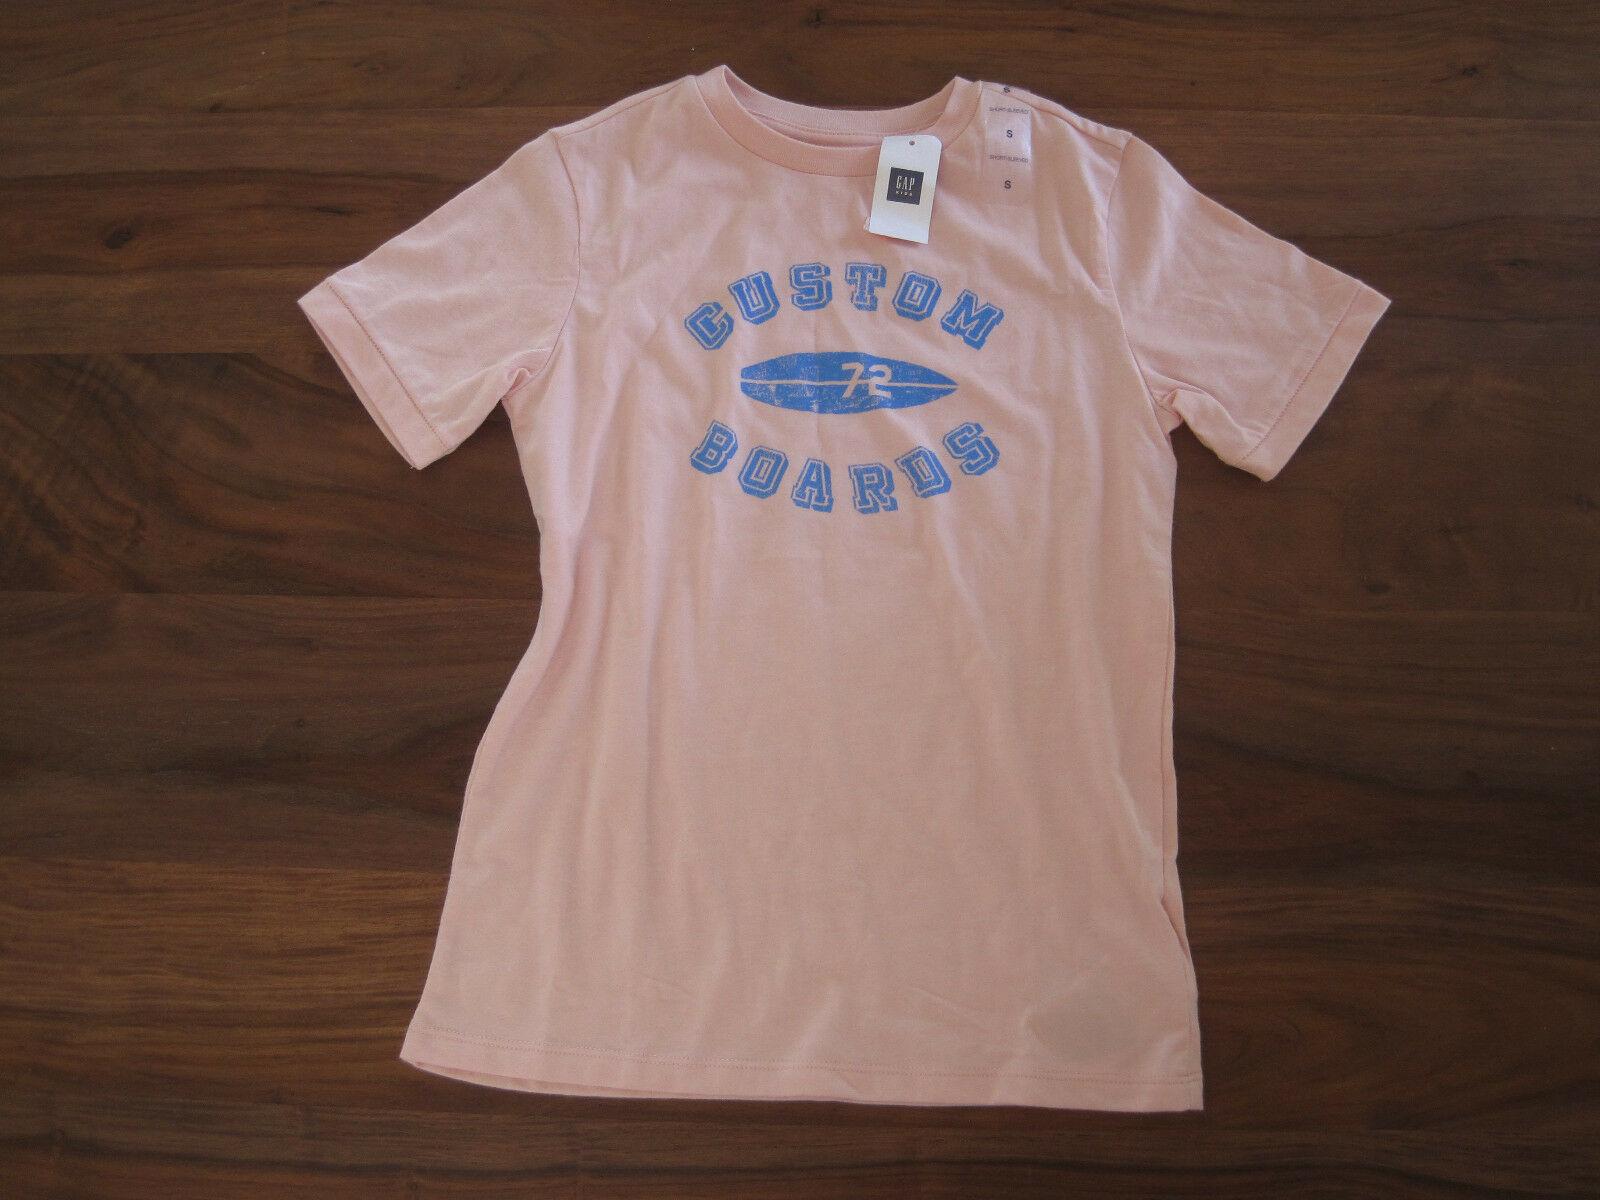 GAP Kids Girls T-shirt Top S 6 7 Short Sleeve Crew Neck Light Pink Graphic New